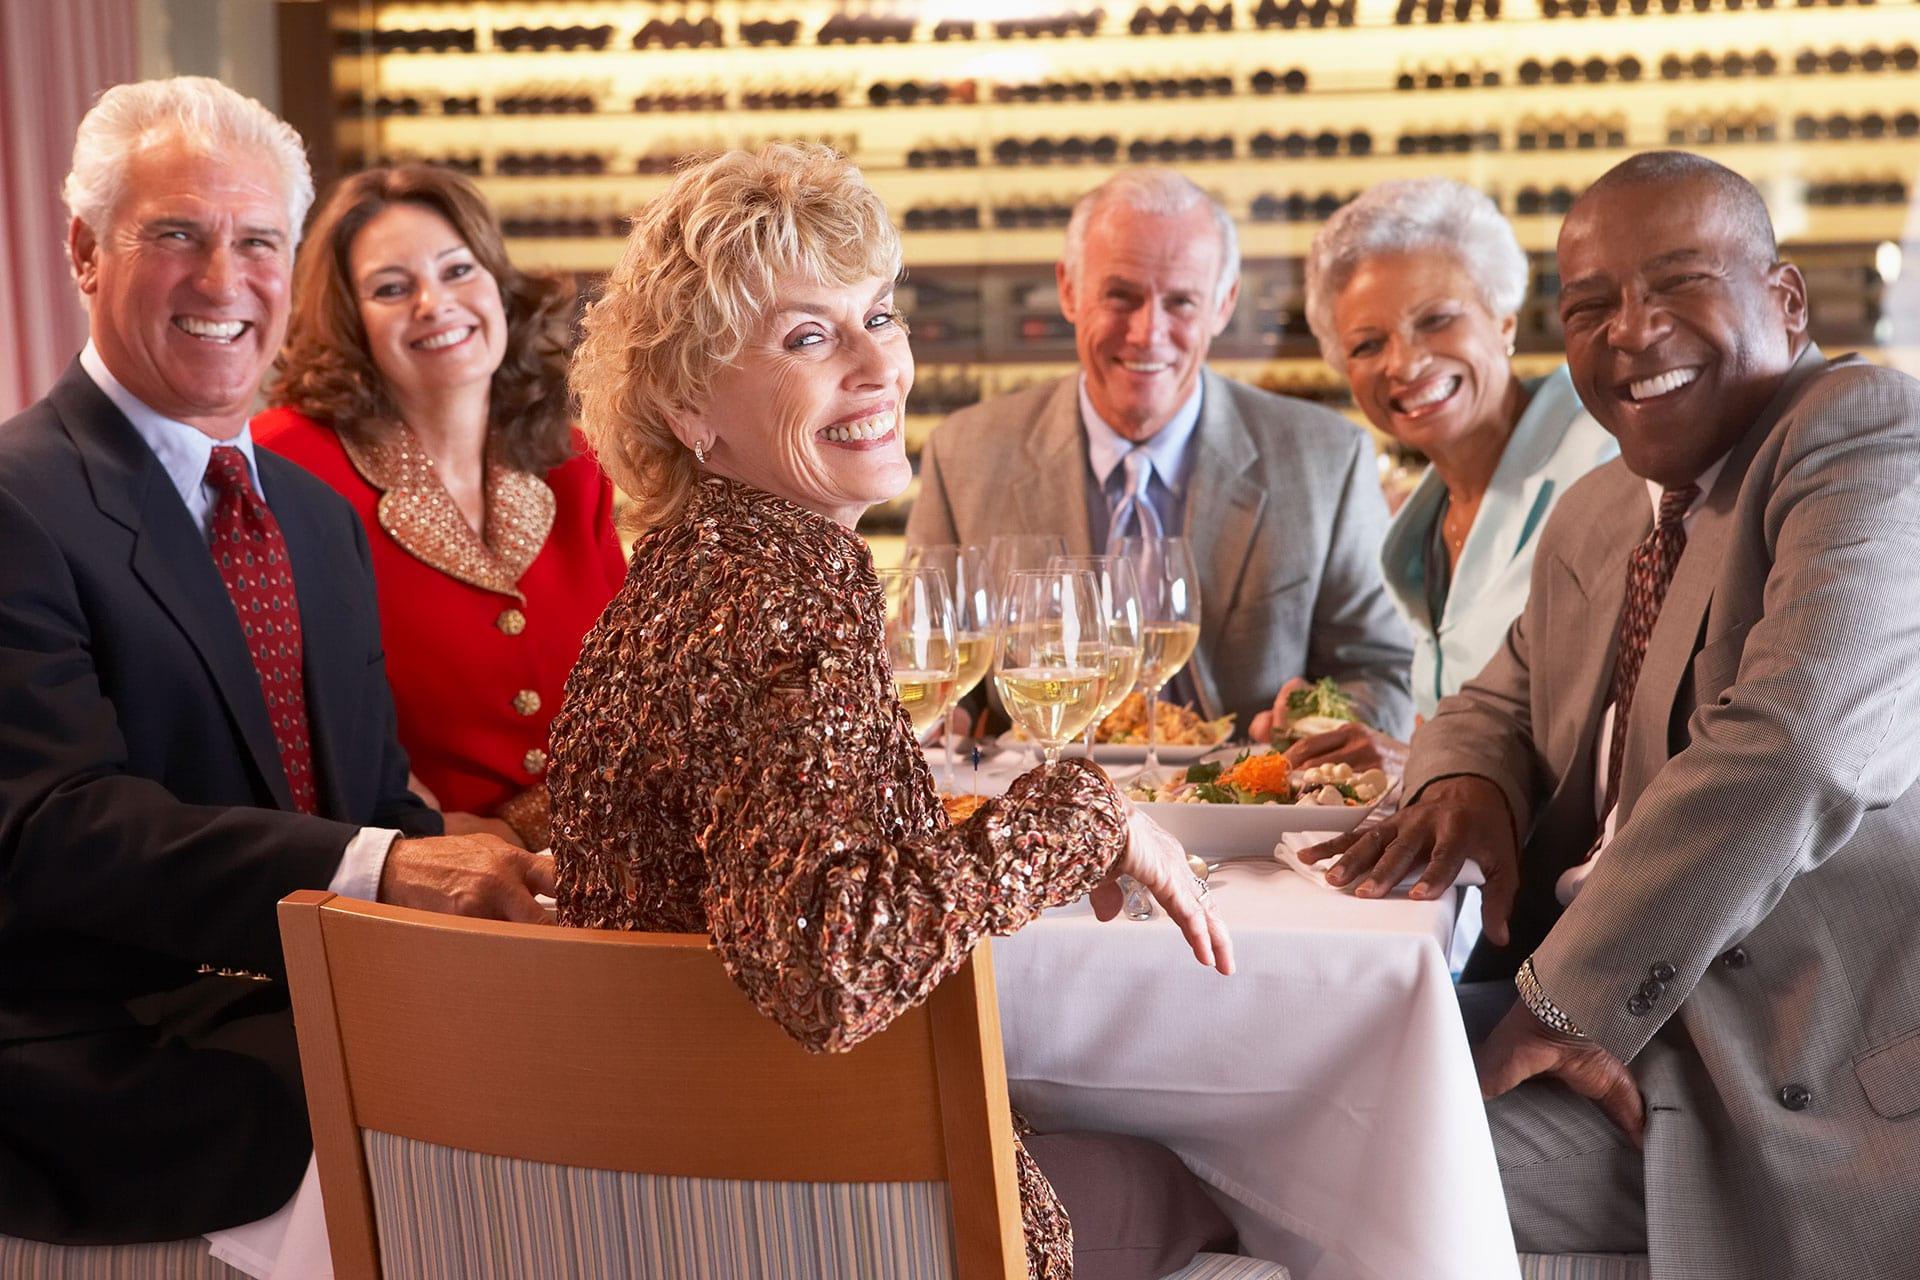 dental implant patients having dinner